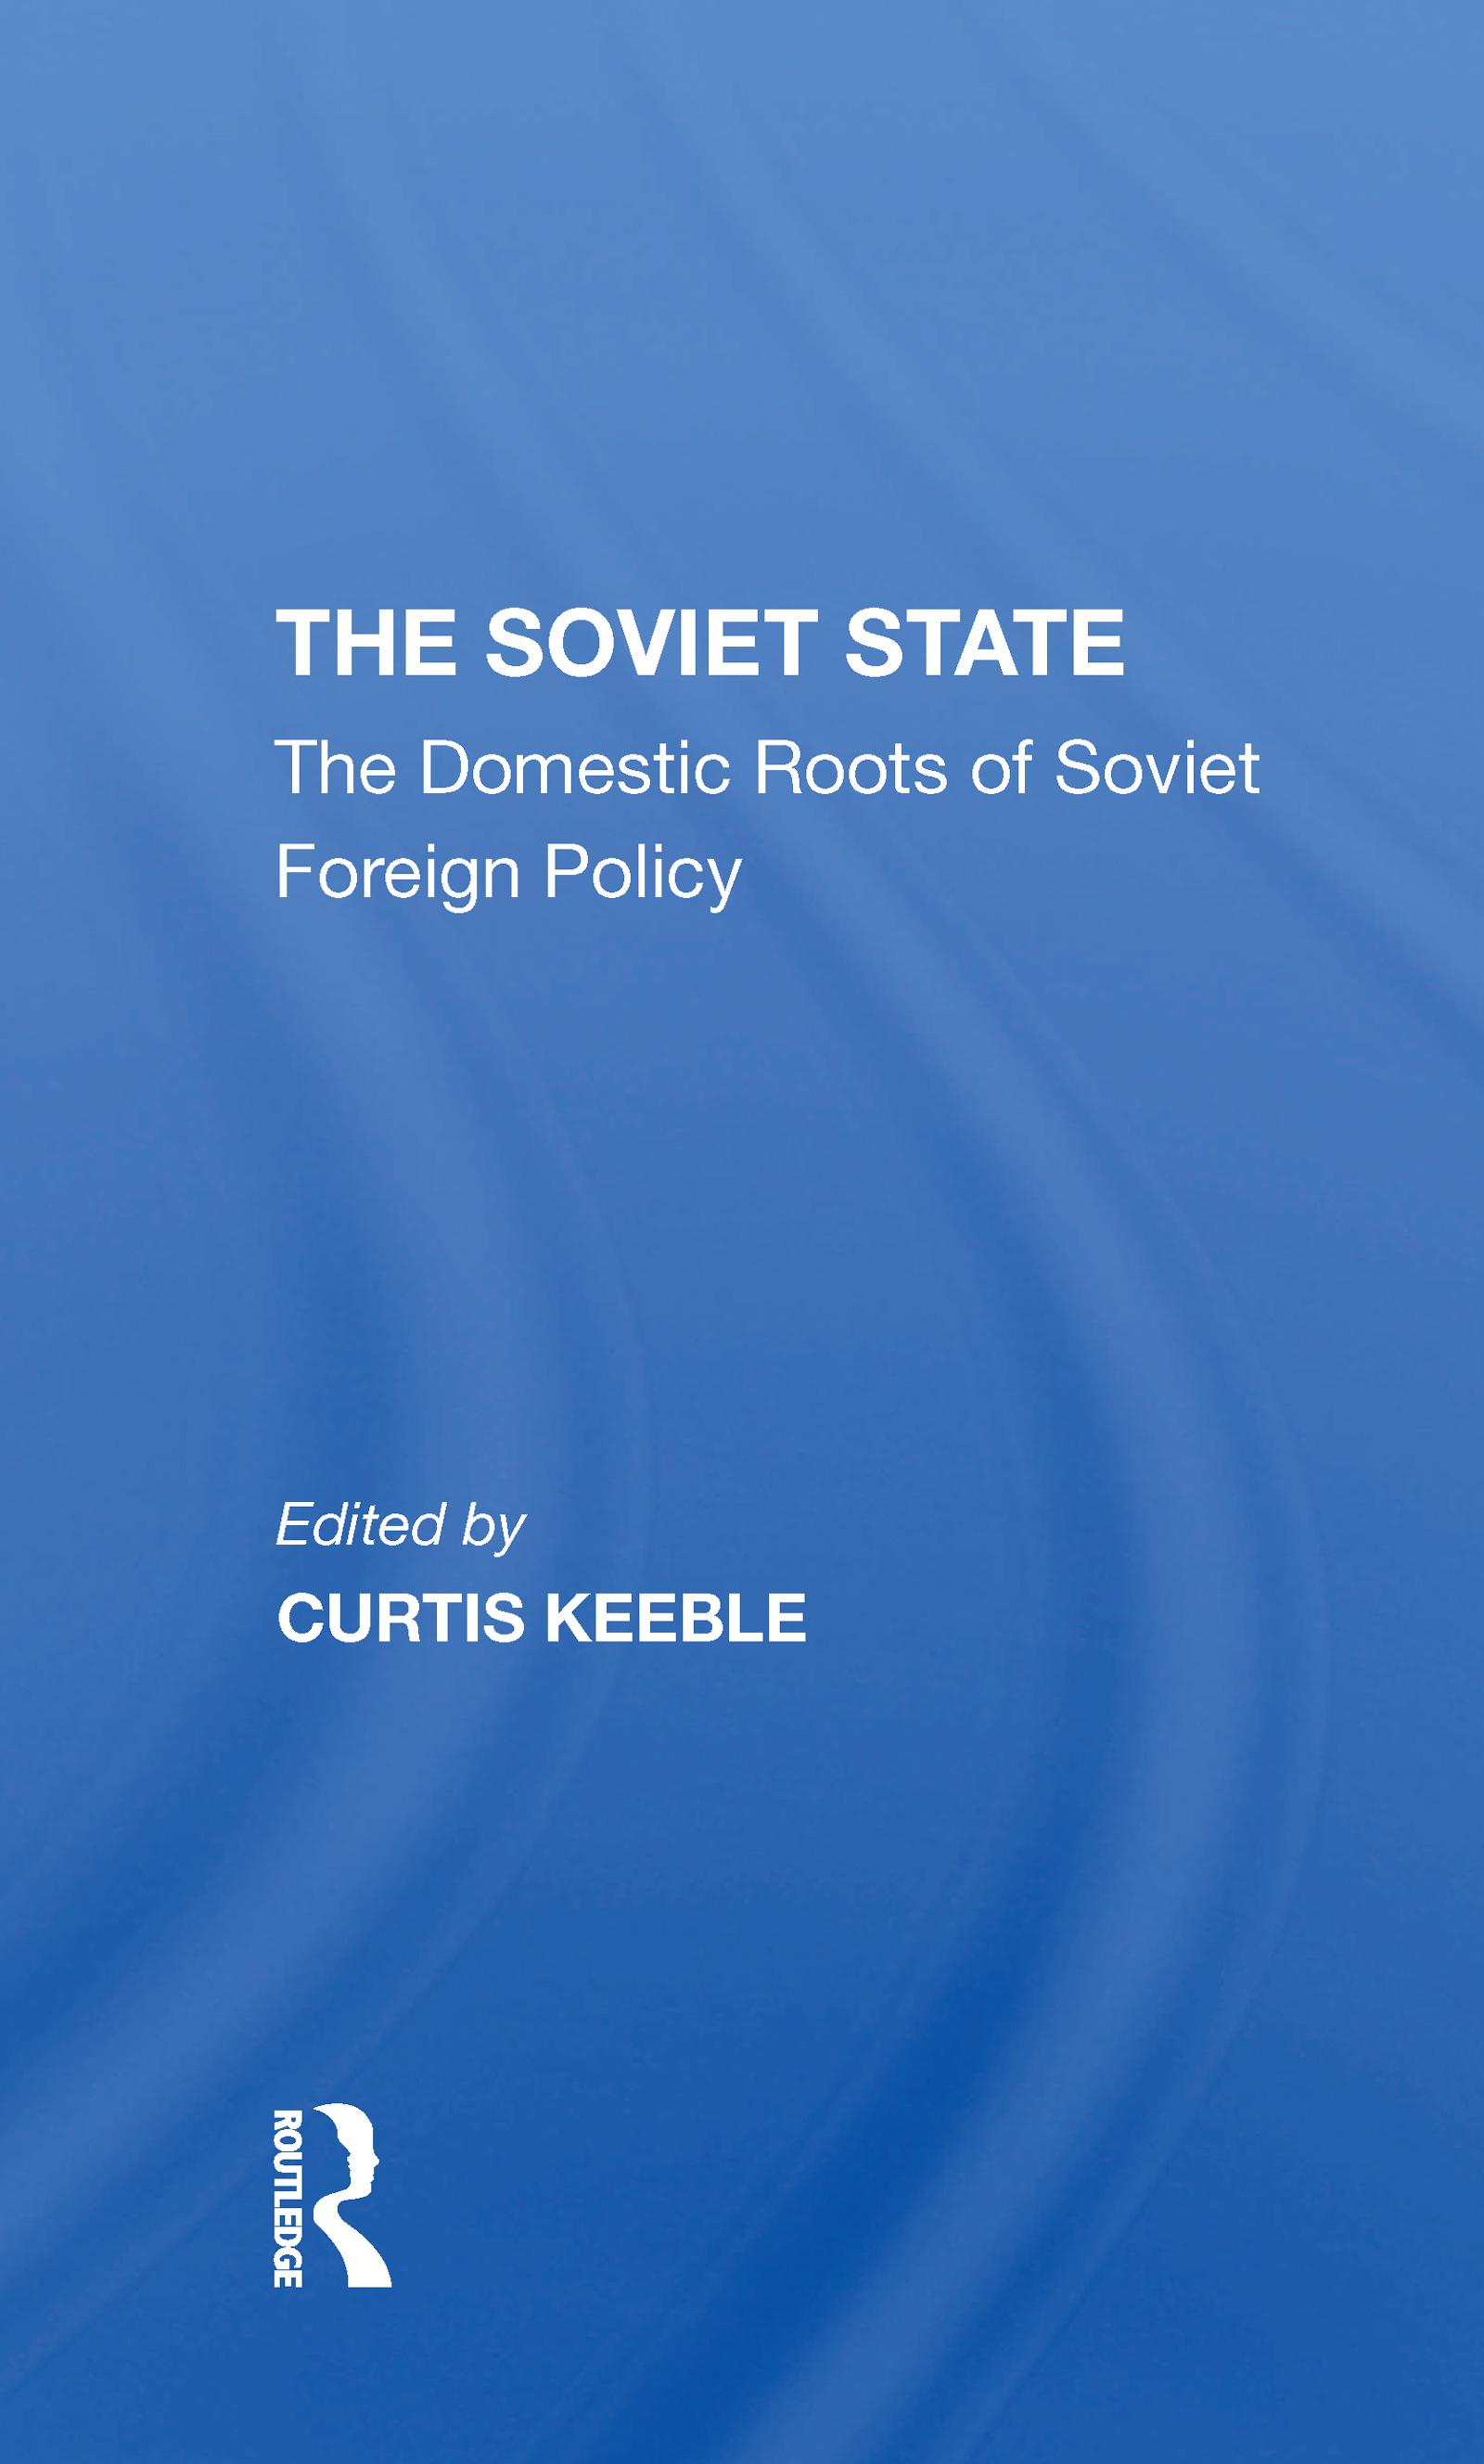 The Soviet State